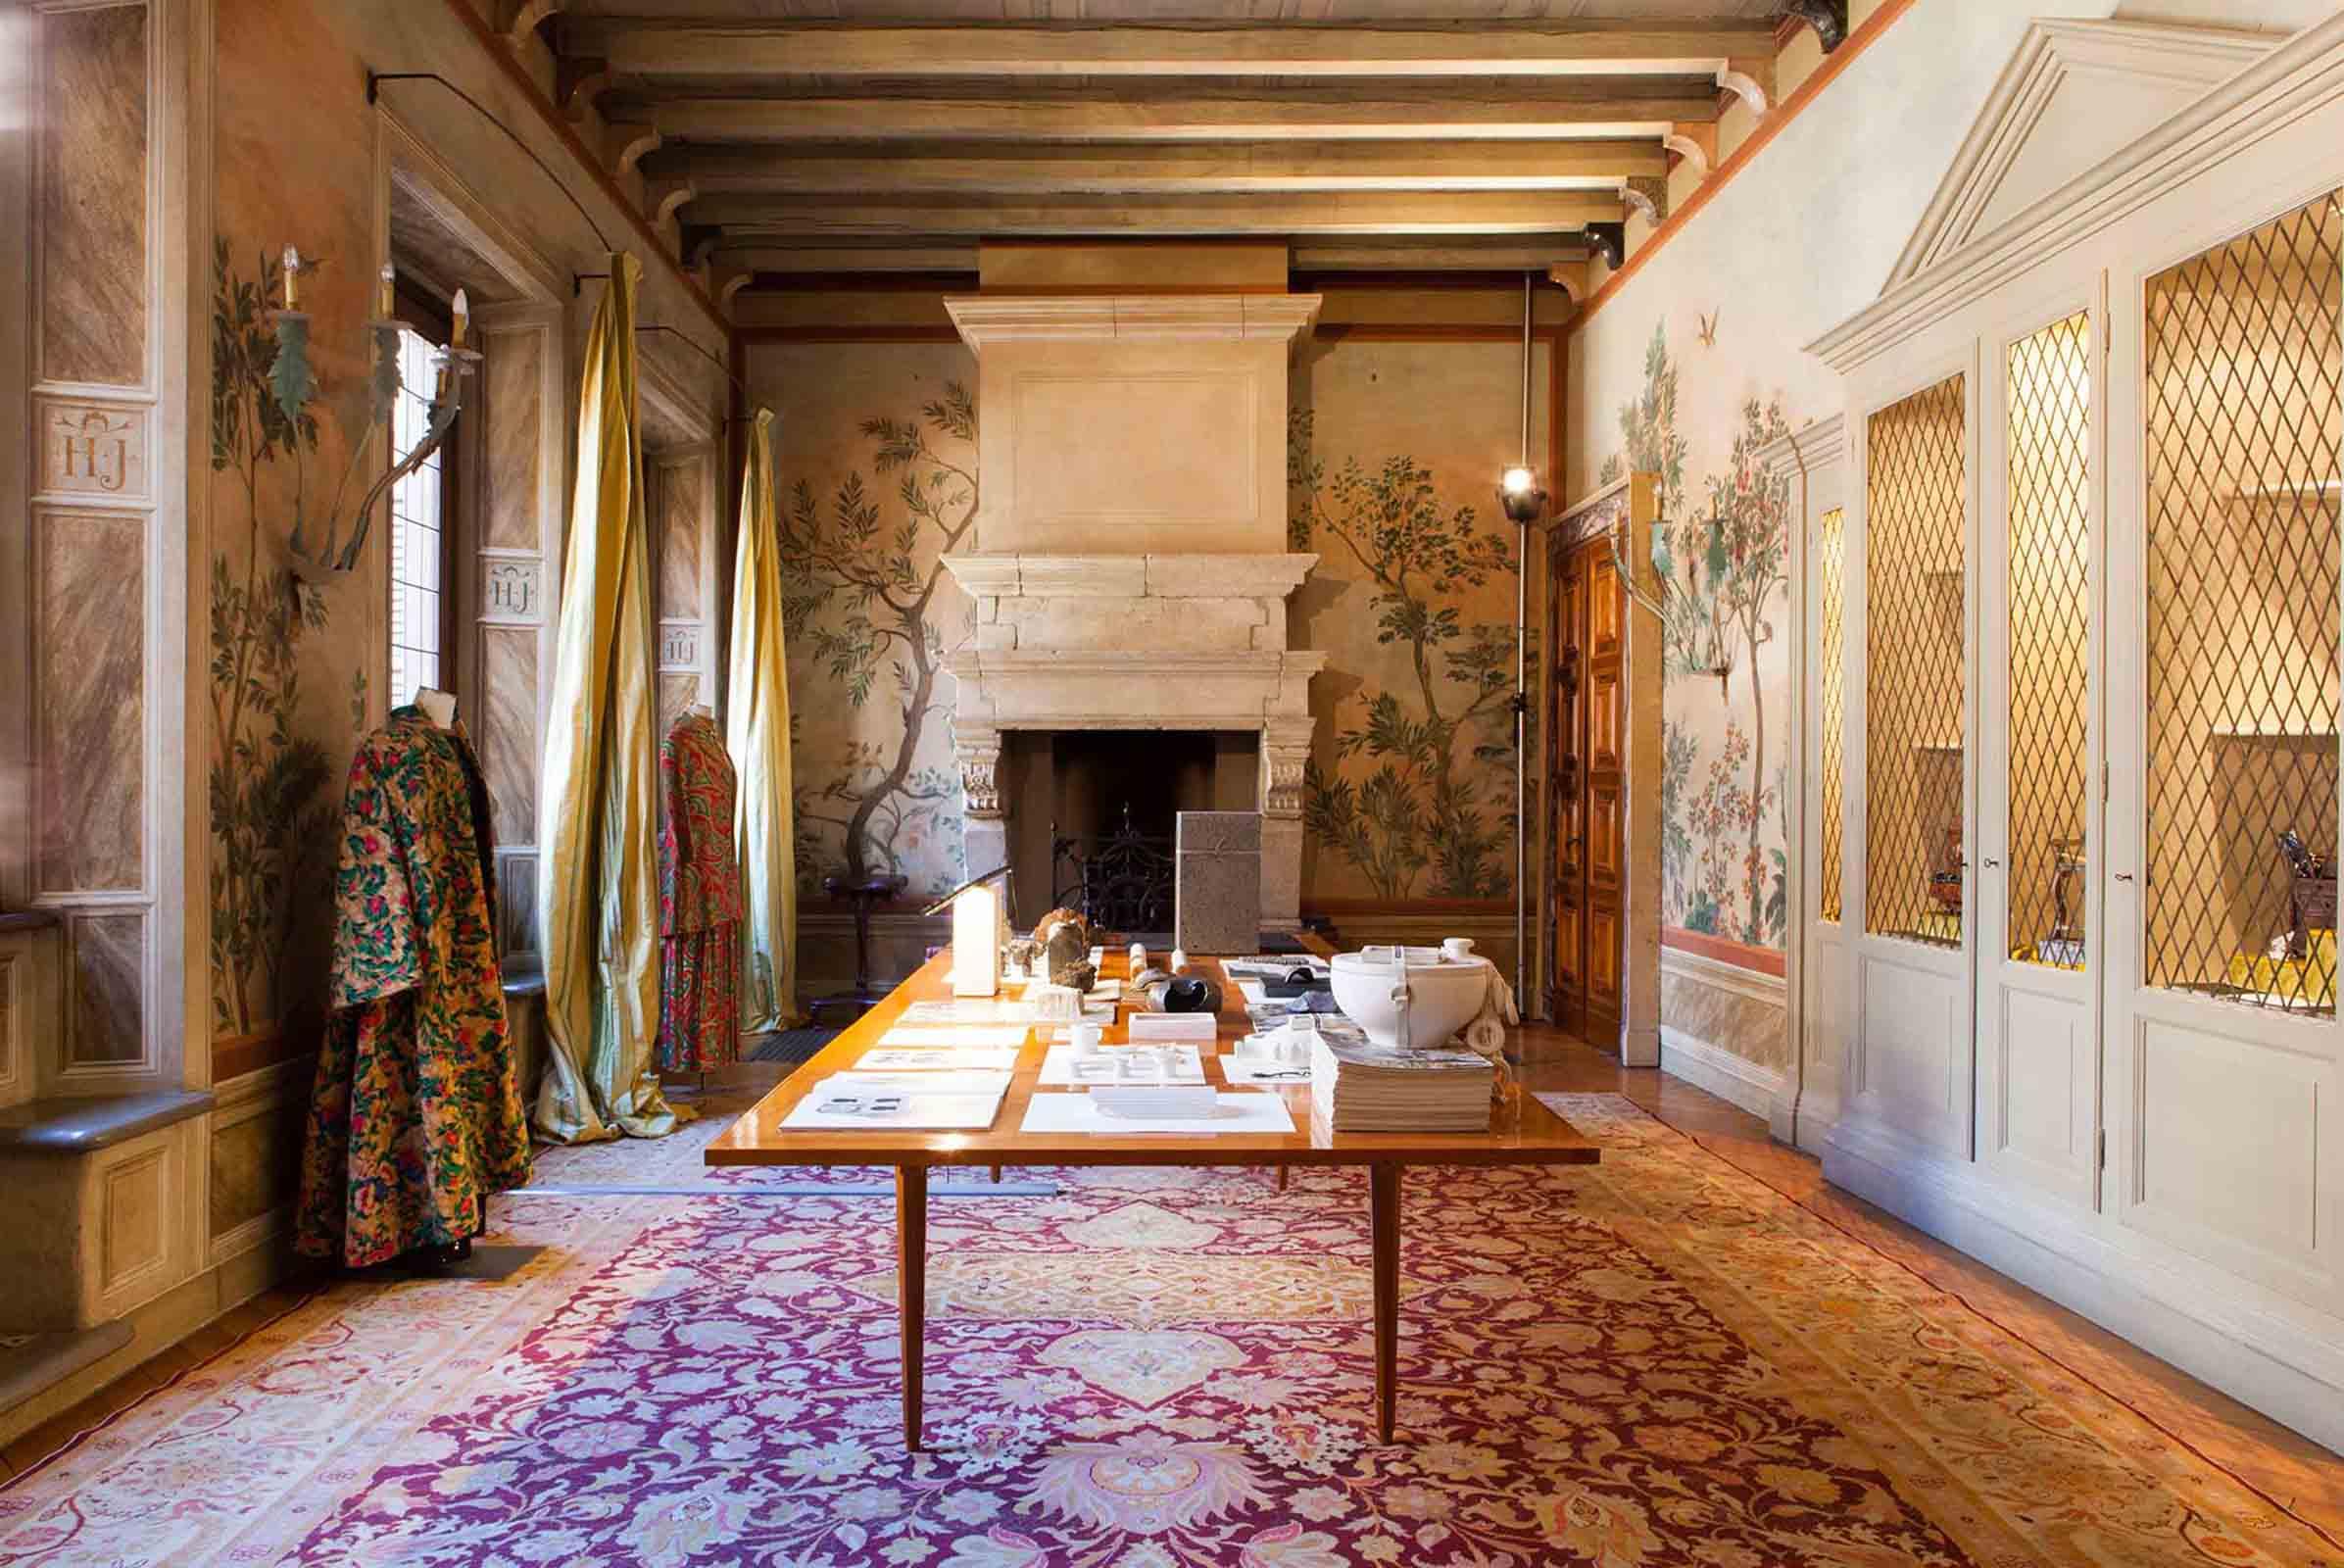 Passeggiata,-An-Airbnb-Experience-of-Milan,-image-7.jpg